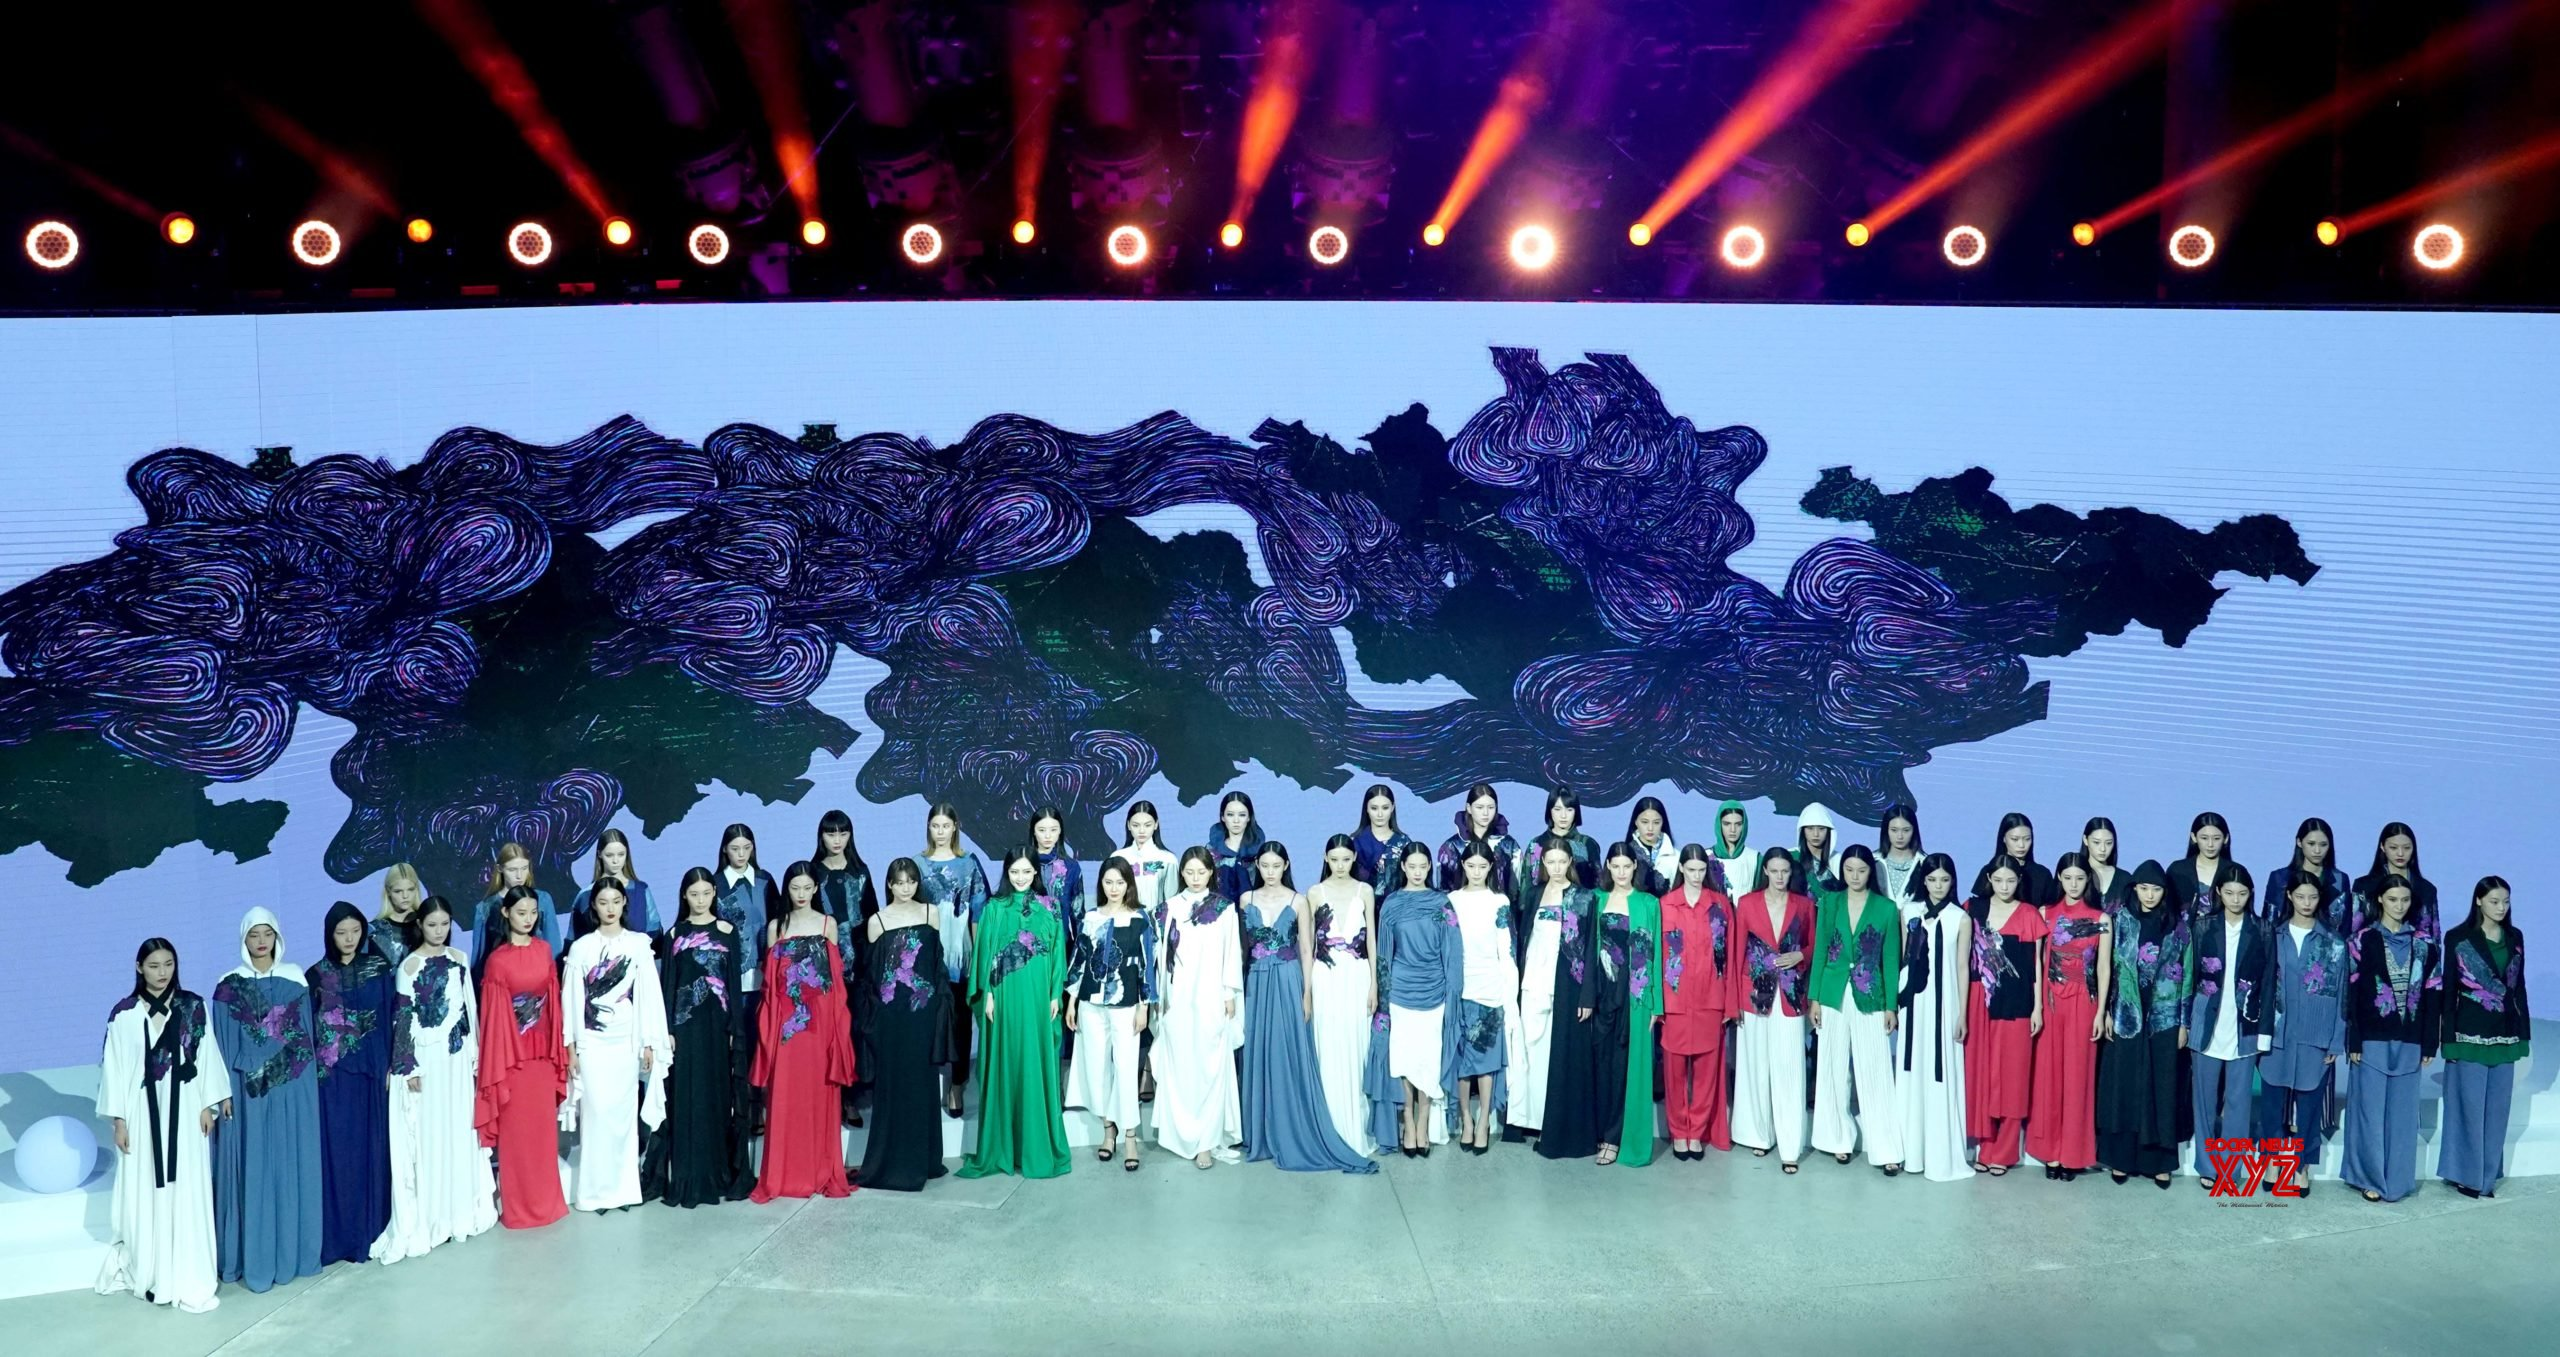 CHINA - BEIJING - FASHION WEEK #Gallery